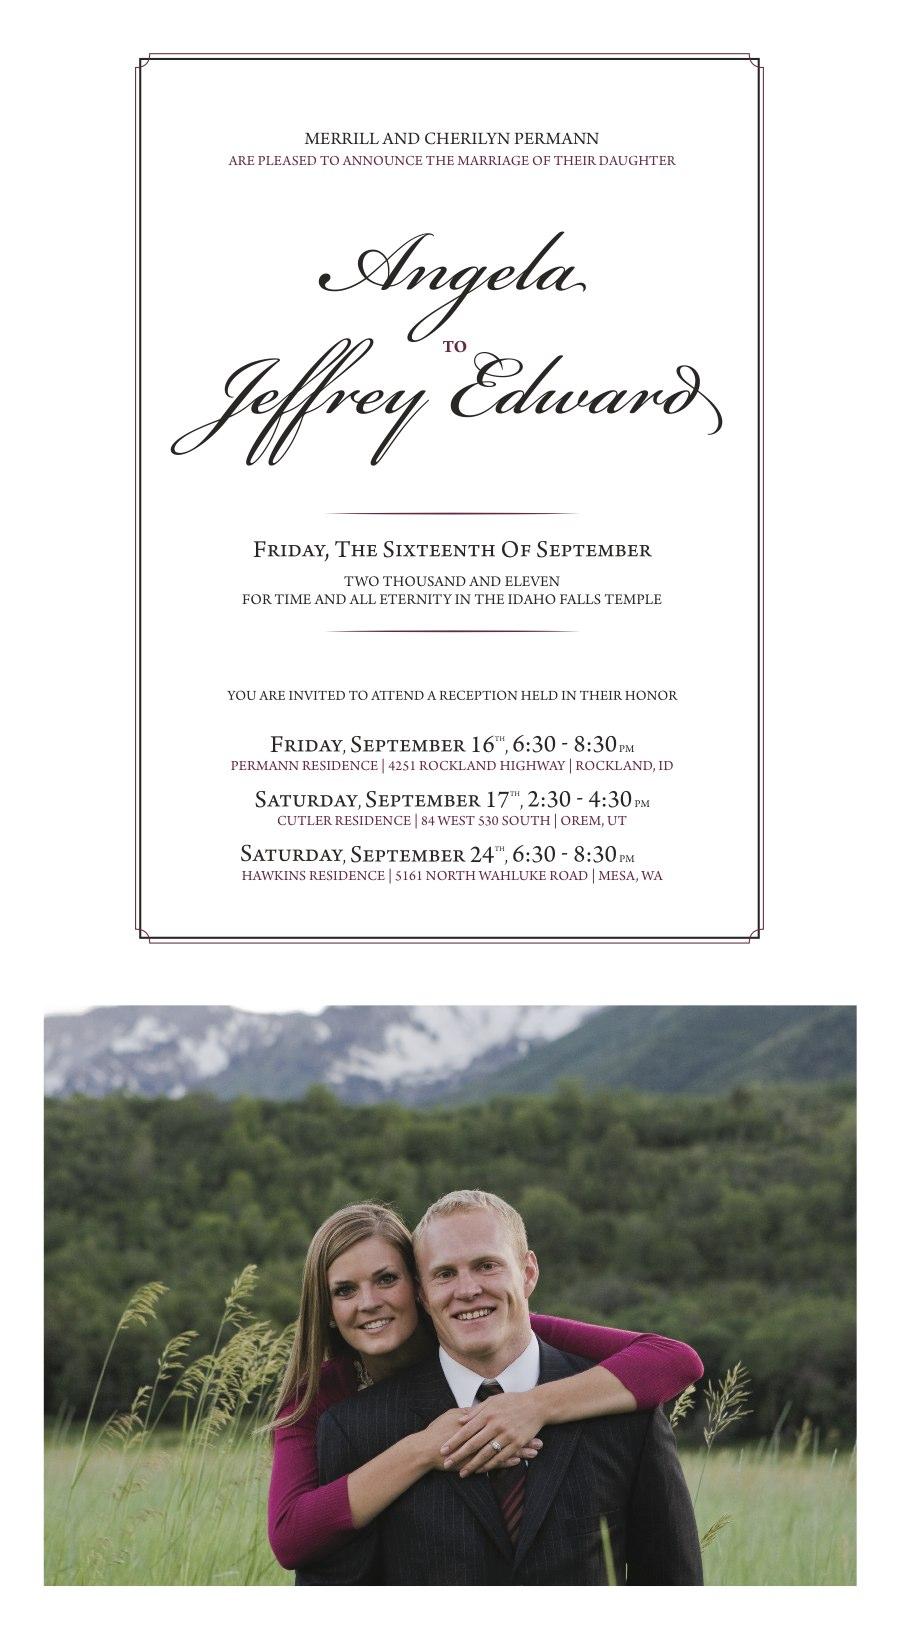 Wedding invitations provo wedding guide diy invitation monicamarmolfo Images